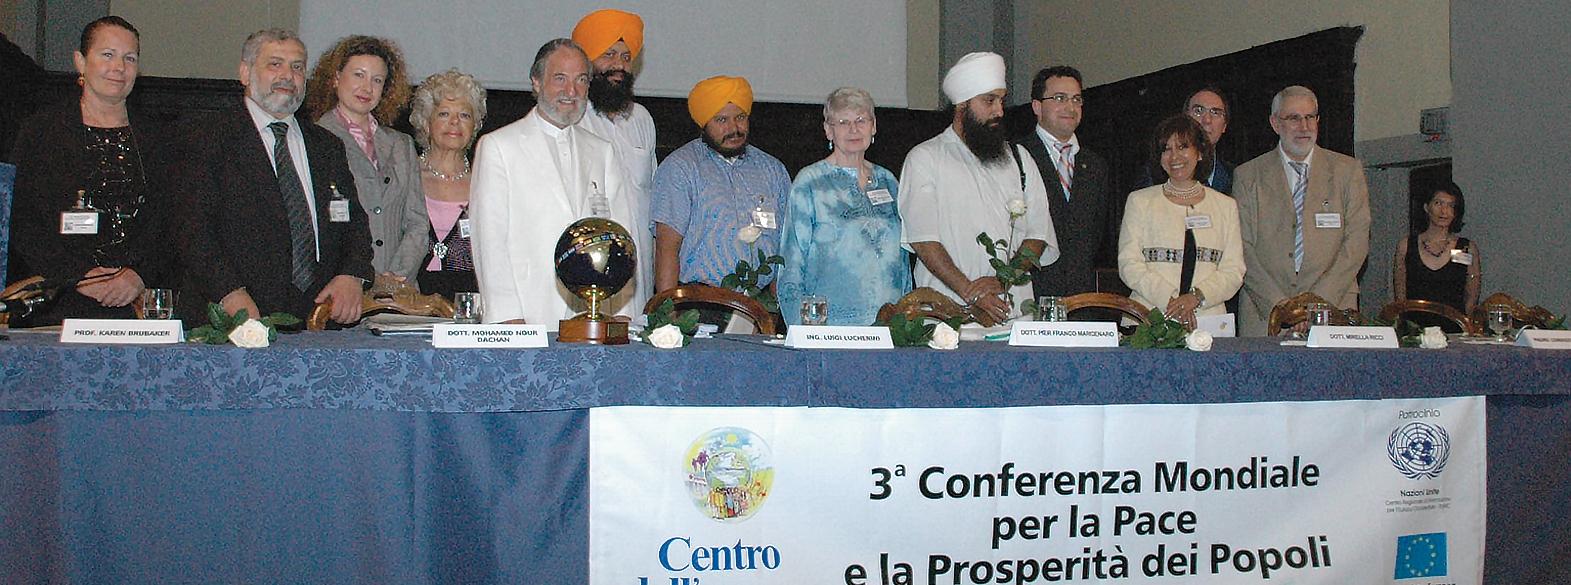 III Всемирная Конференция во Имя Мира и Благополучия Народов